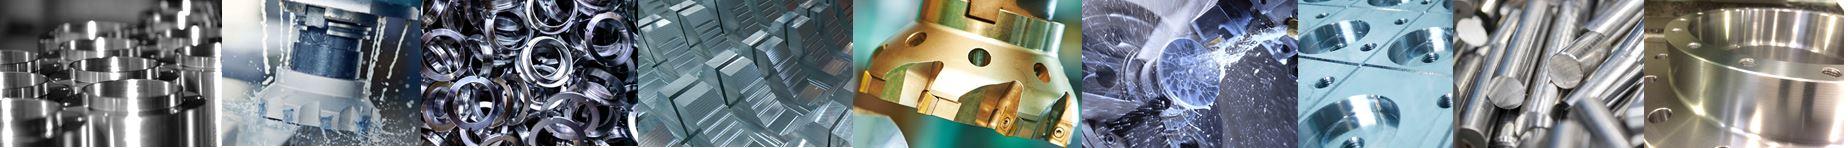 Machine Metaal Industrie